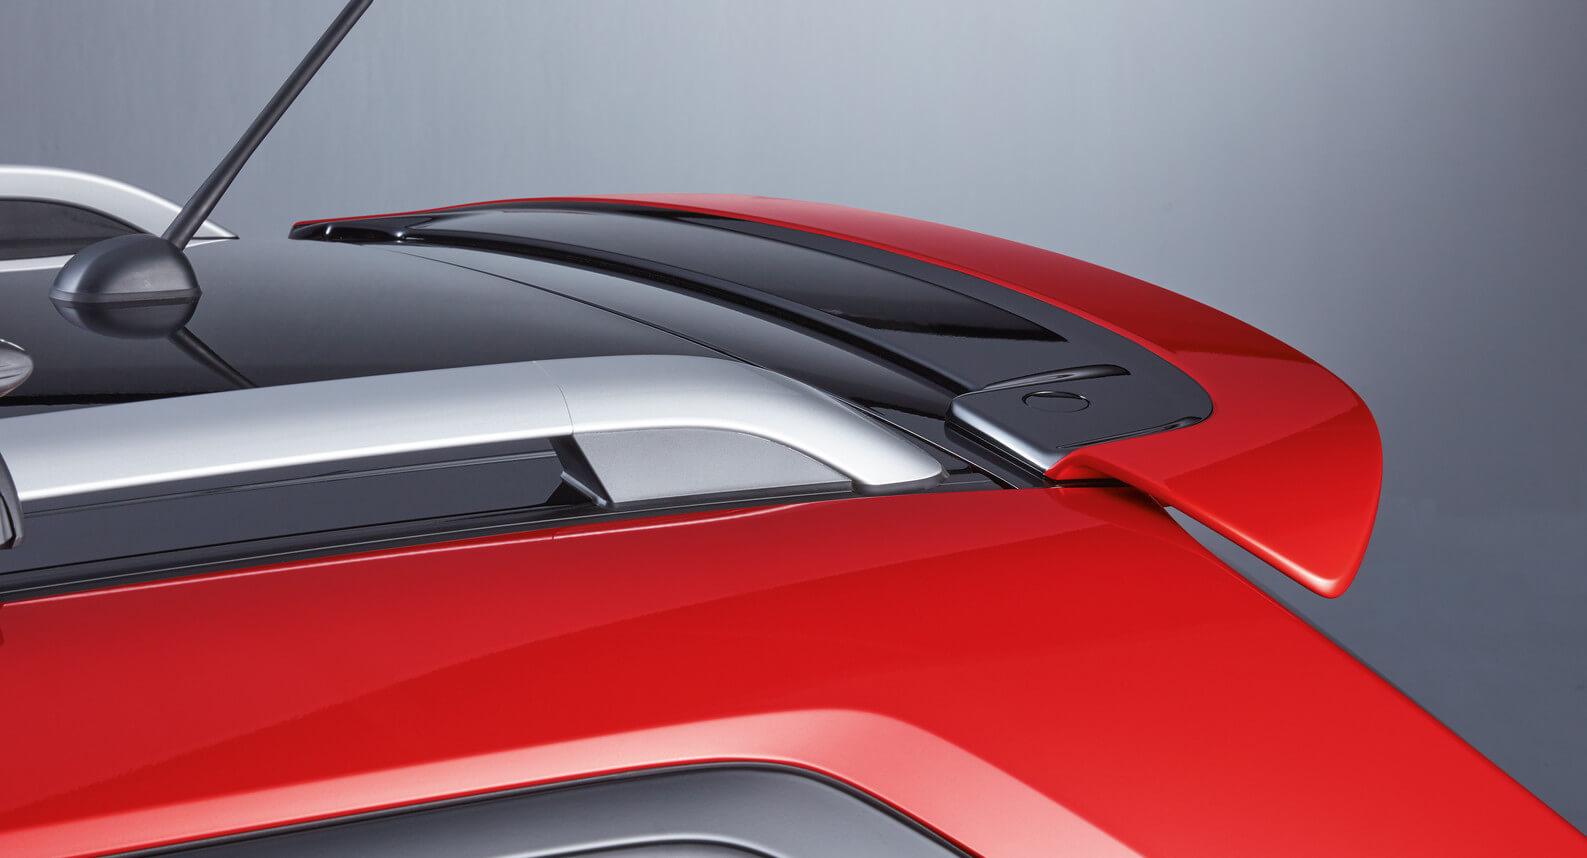 Ignis - Roof Edge Spoiler, Fervent Red